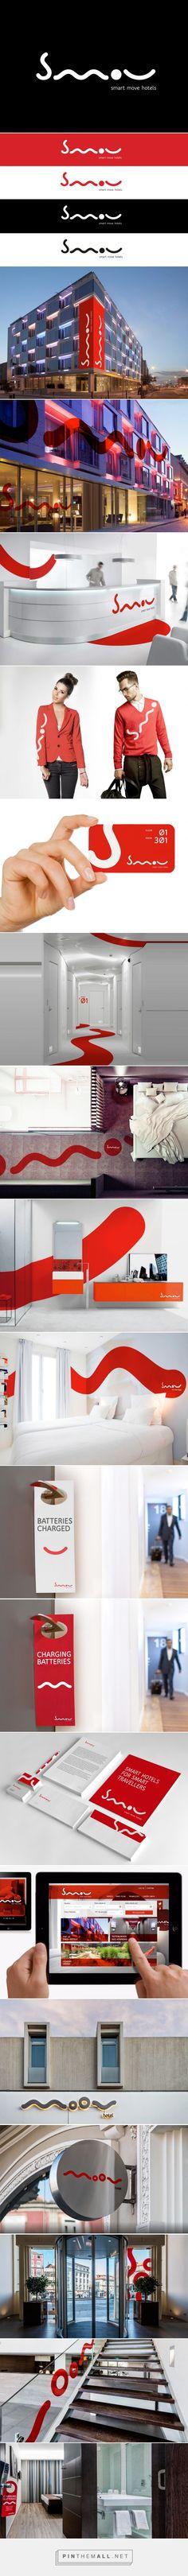 moov _ smart move hotels